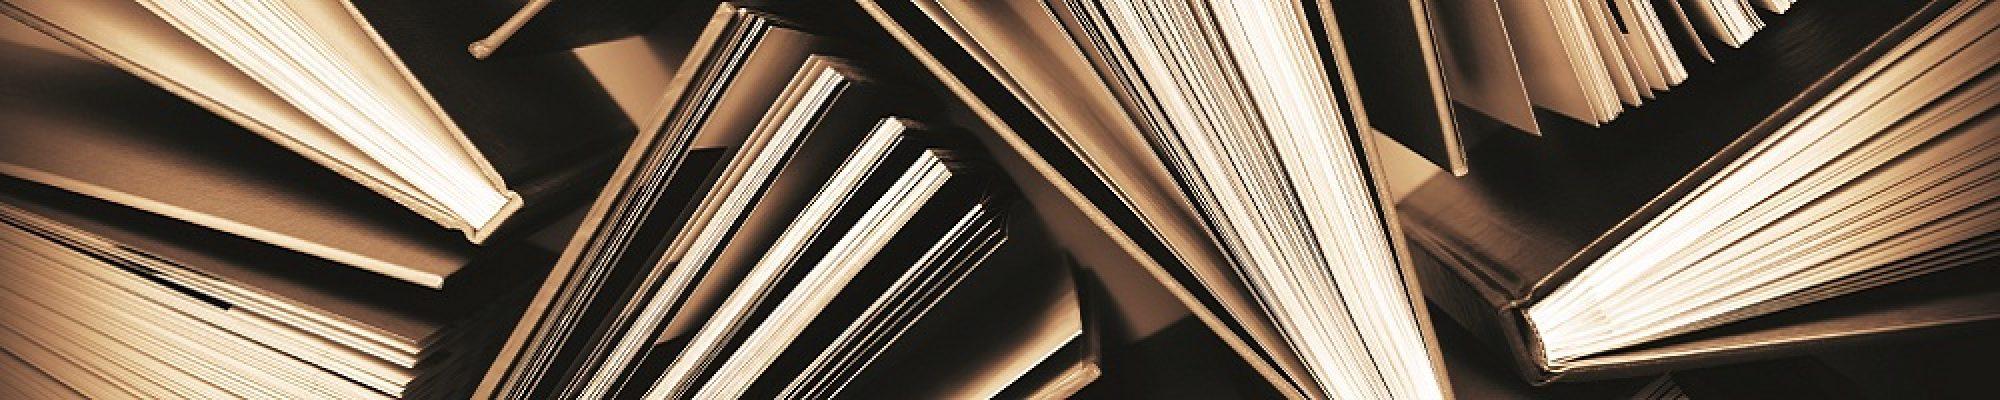 New Yorker in Tondo – Literary Works